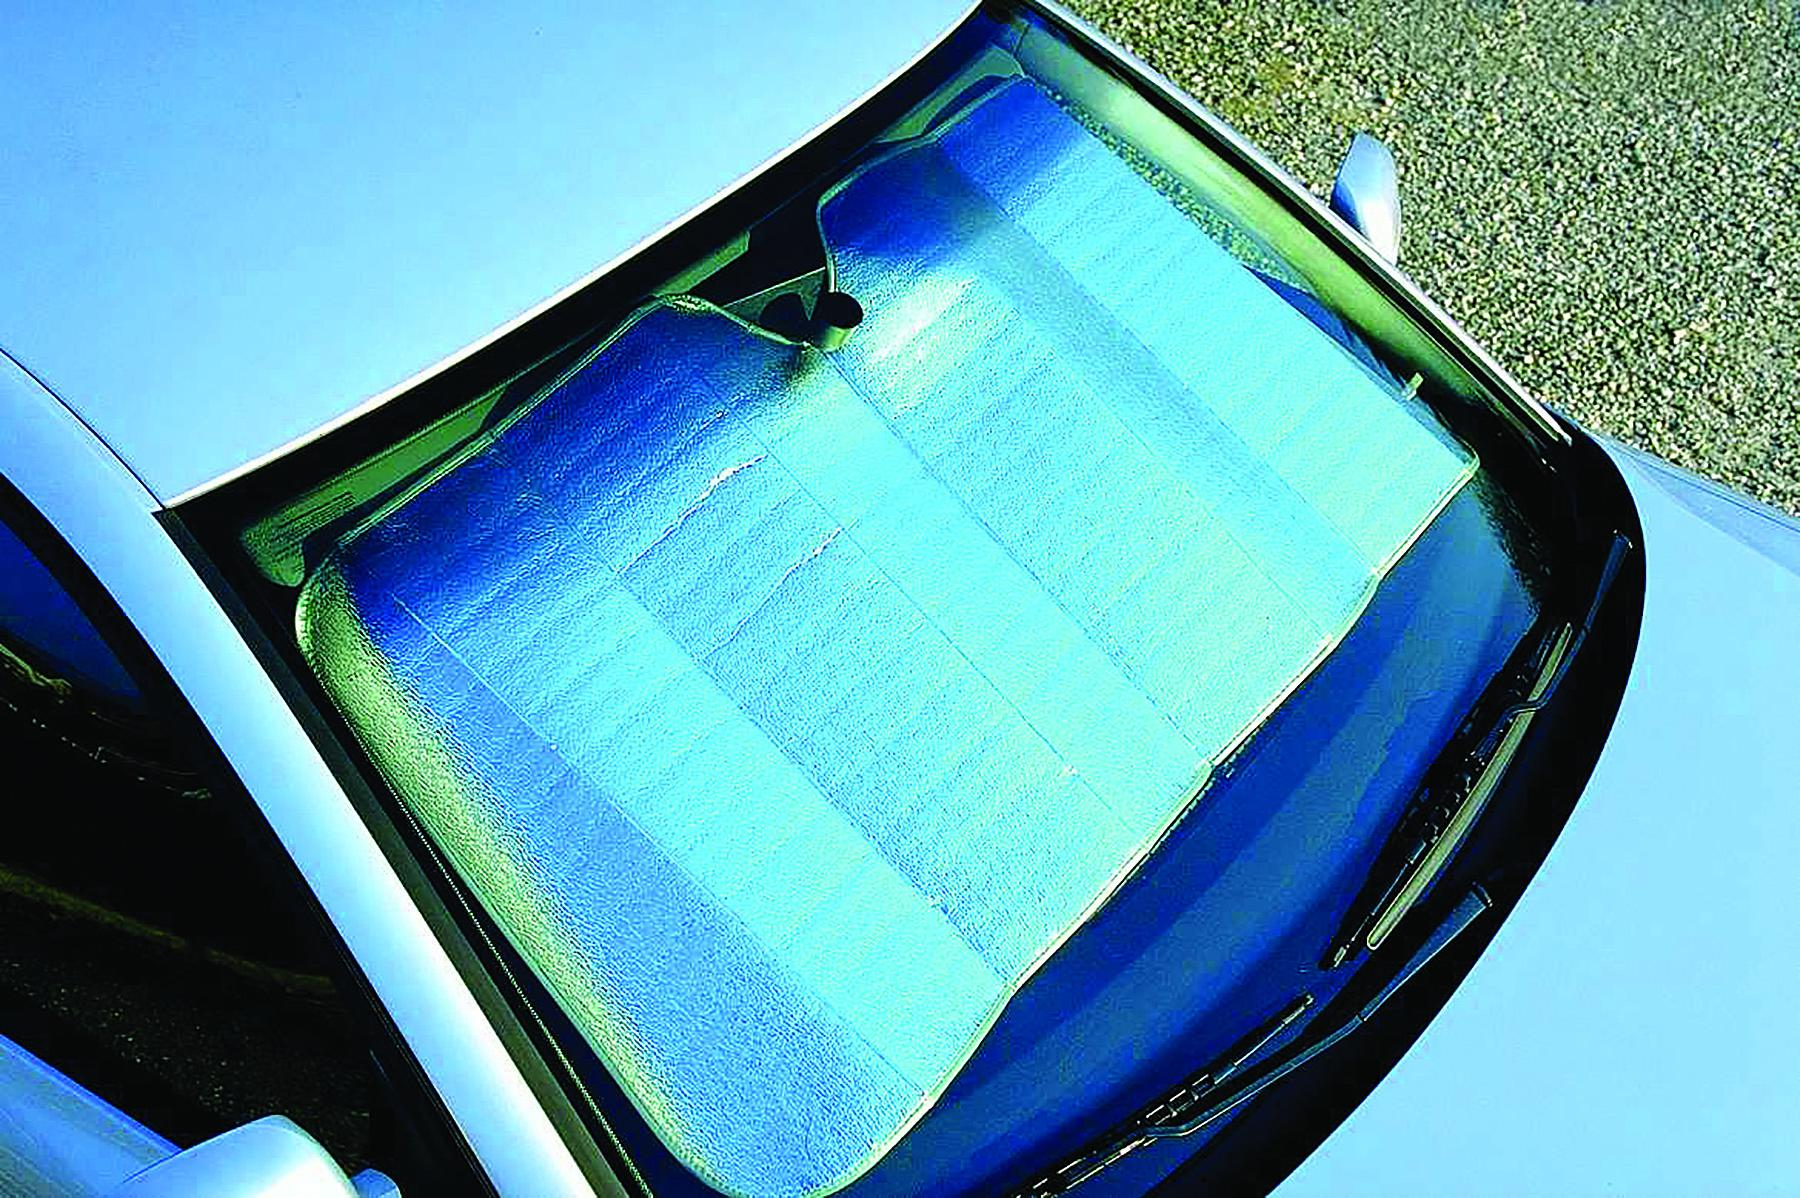 Windscreen cover Carlinea 463546 expert knowledge